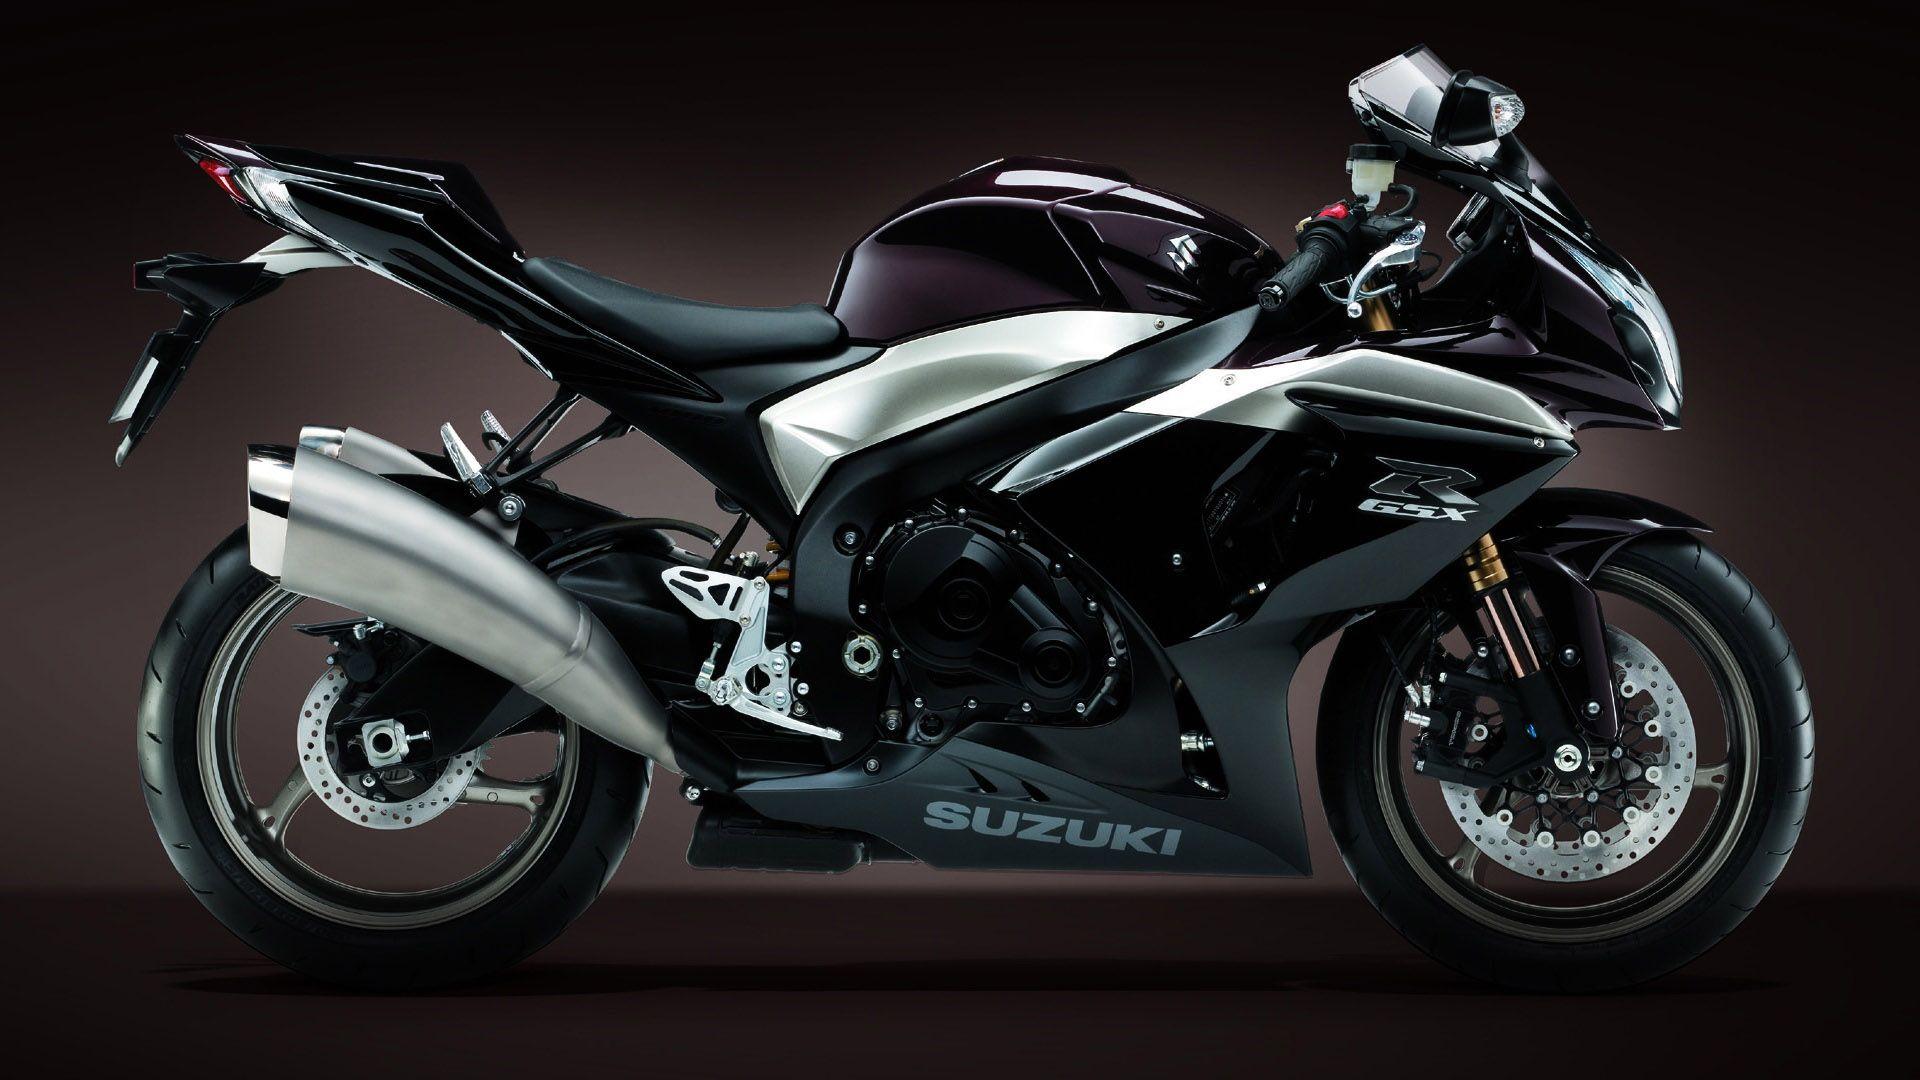 Hd wallpaper bike - Cars And Bikes Hd Wallpapers 1080p Http Www Stosum Com